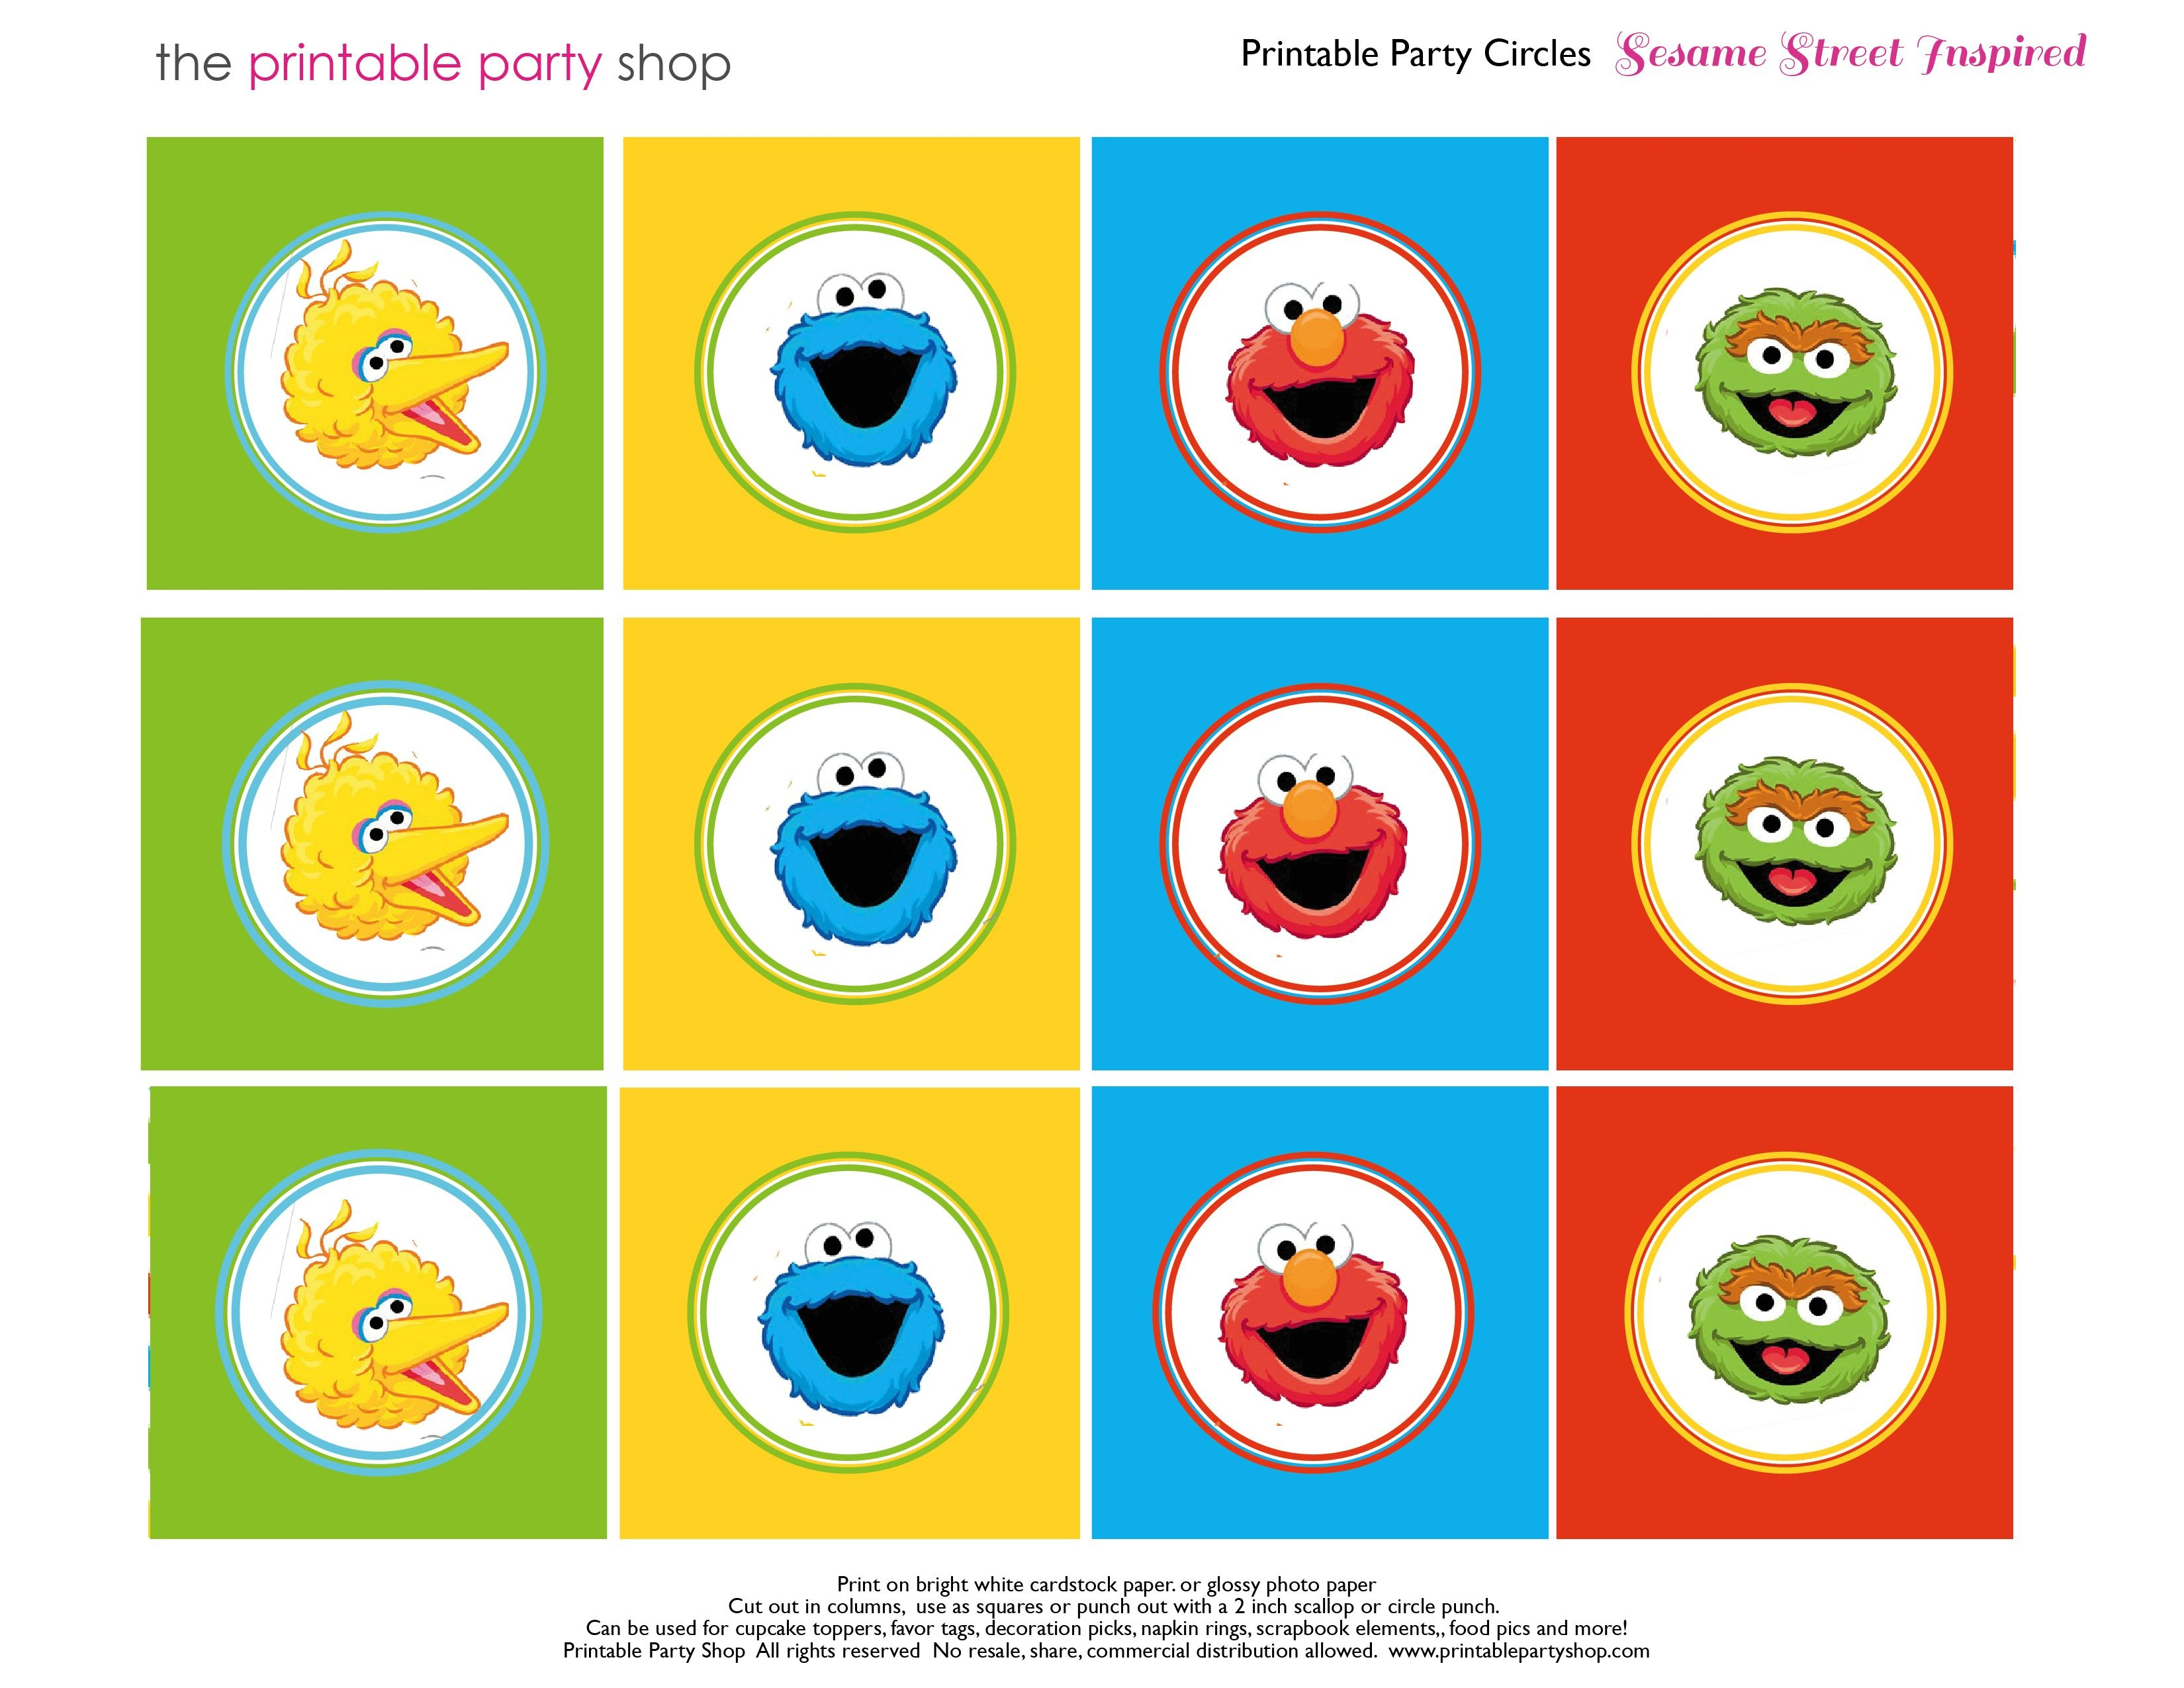 Free Sesame Street Printables | Party-Circles-Characters-Colorblocks - Free Printable Party Circles